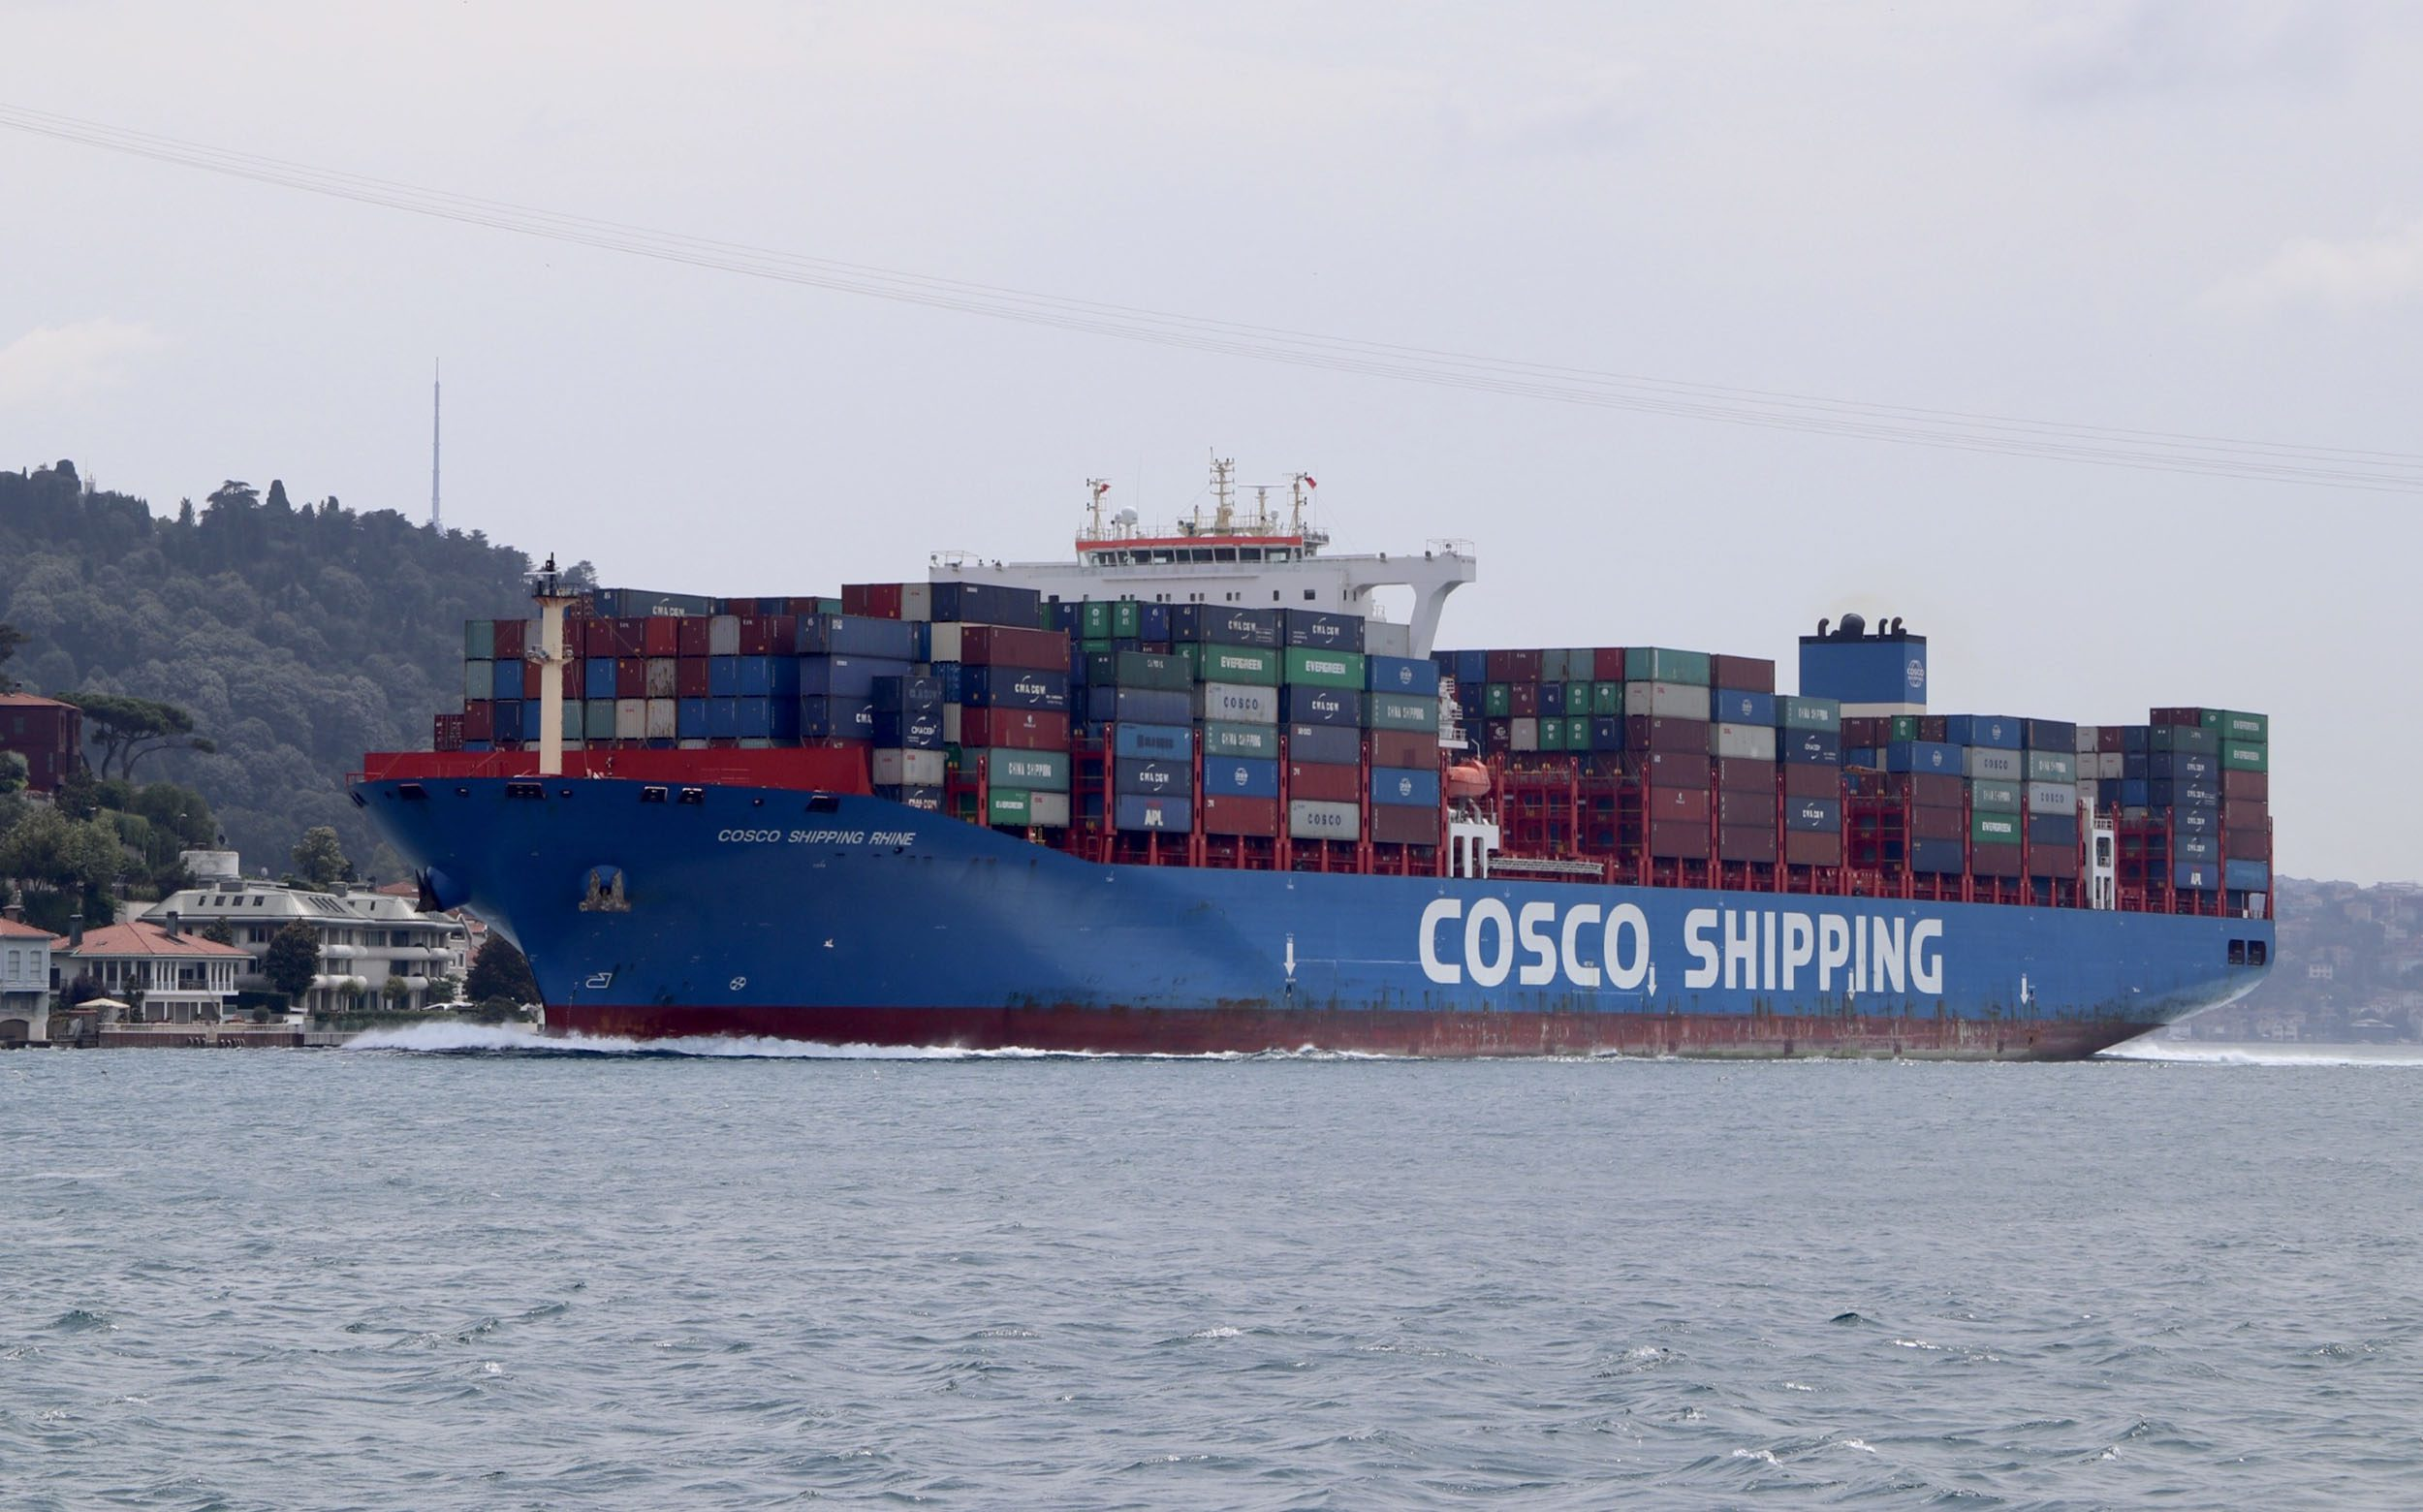 Turkey's global export share reaches 1%, Erdogan says